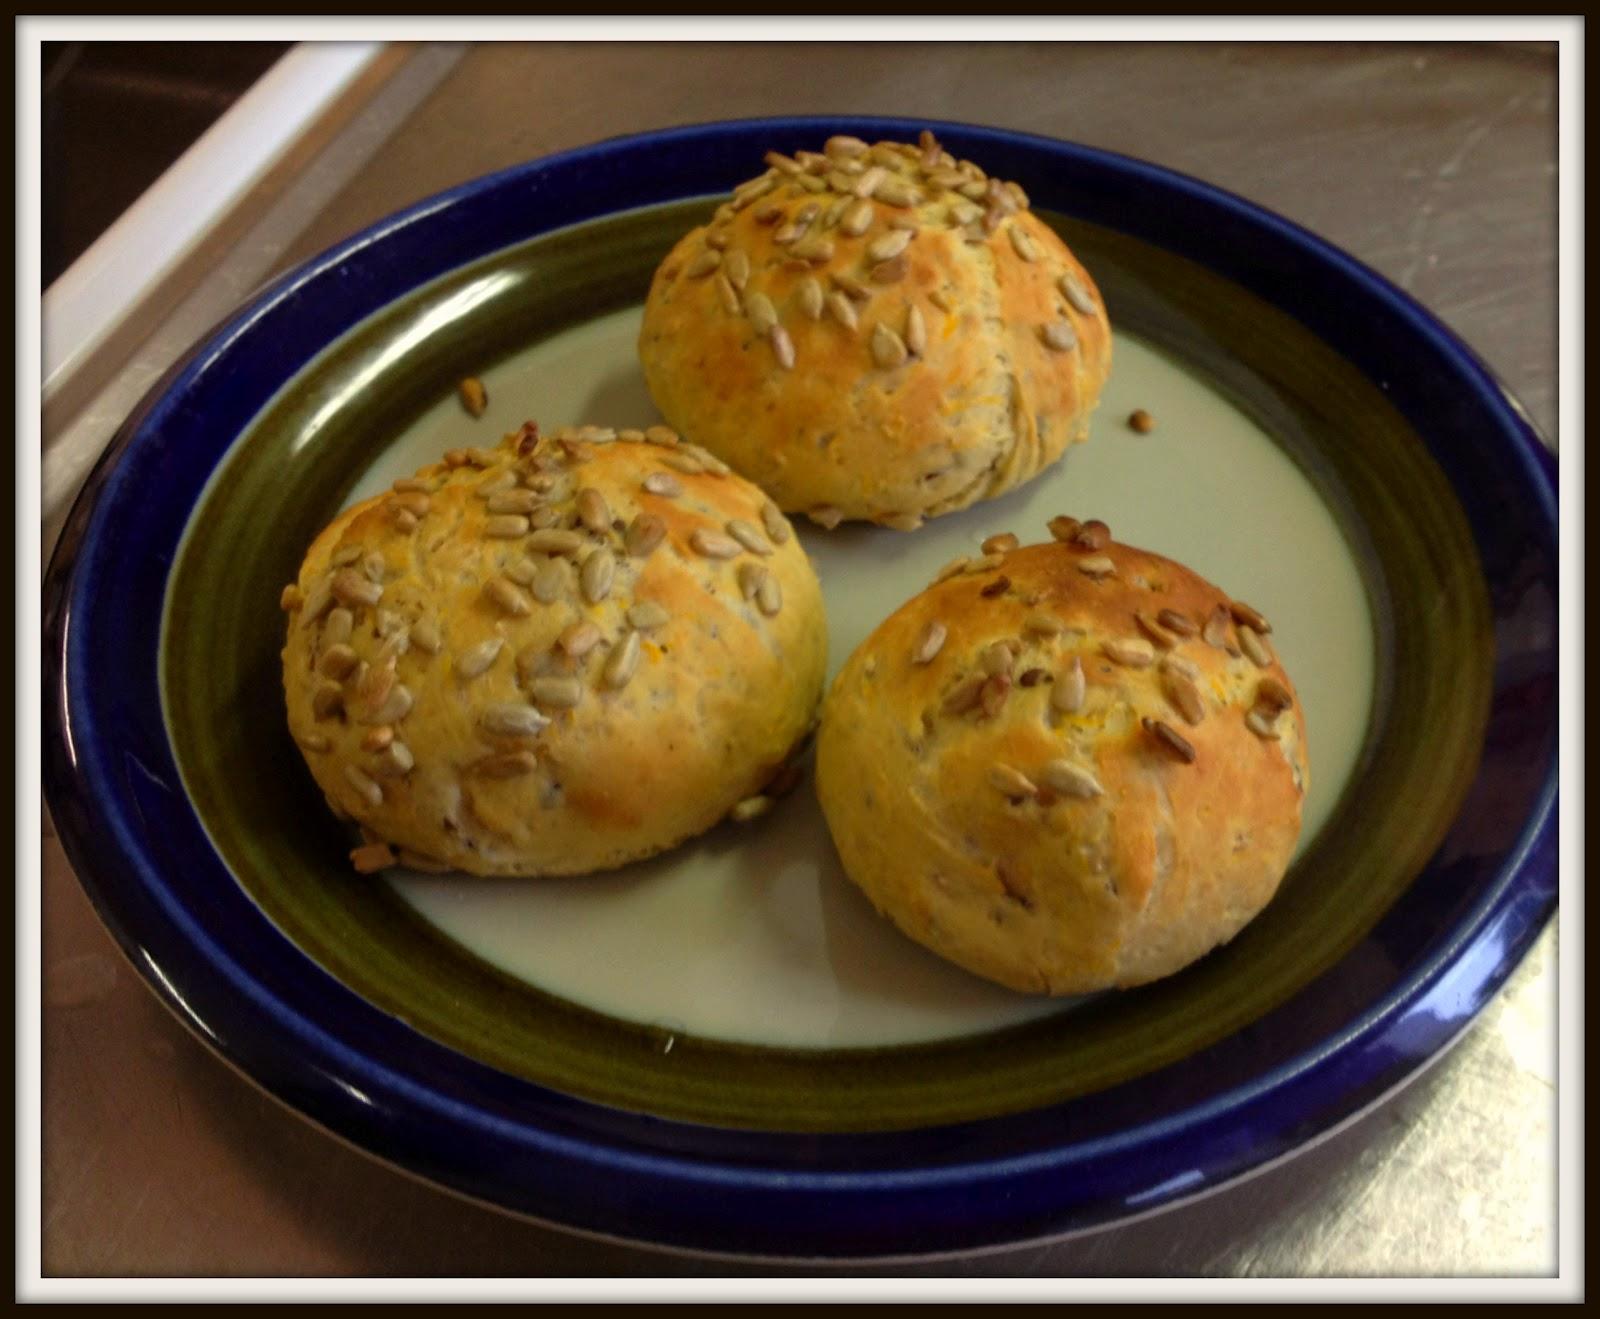 nyttigt bröd med rågmjöl